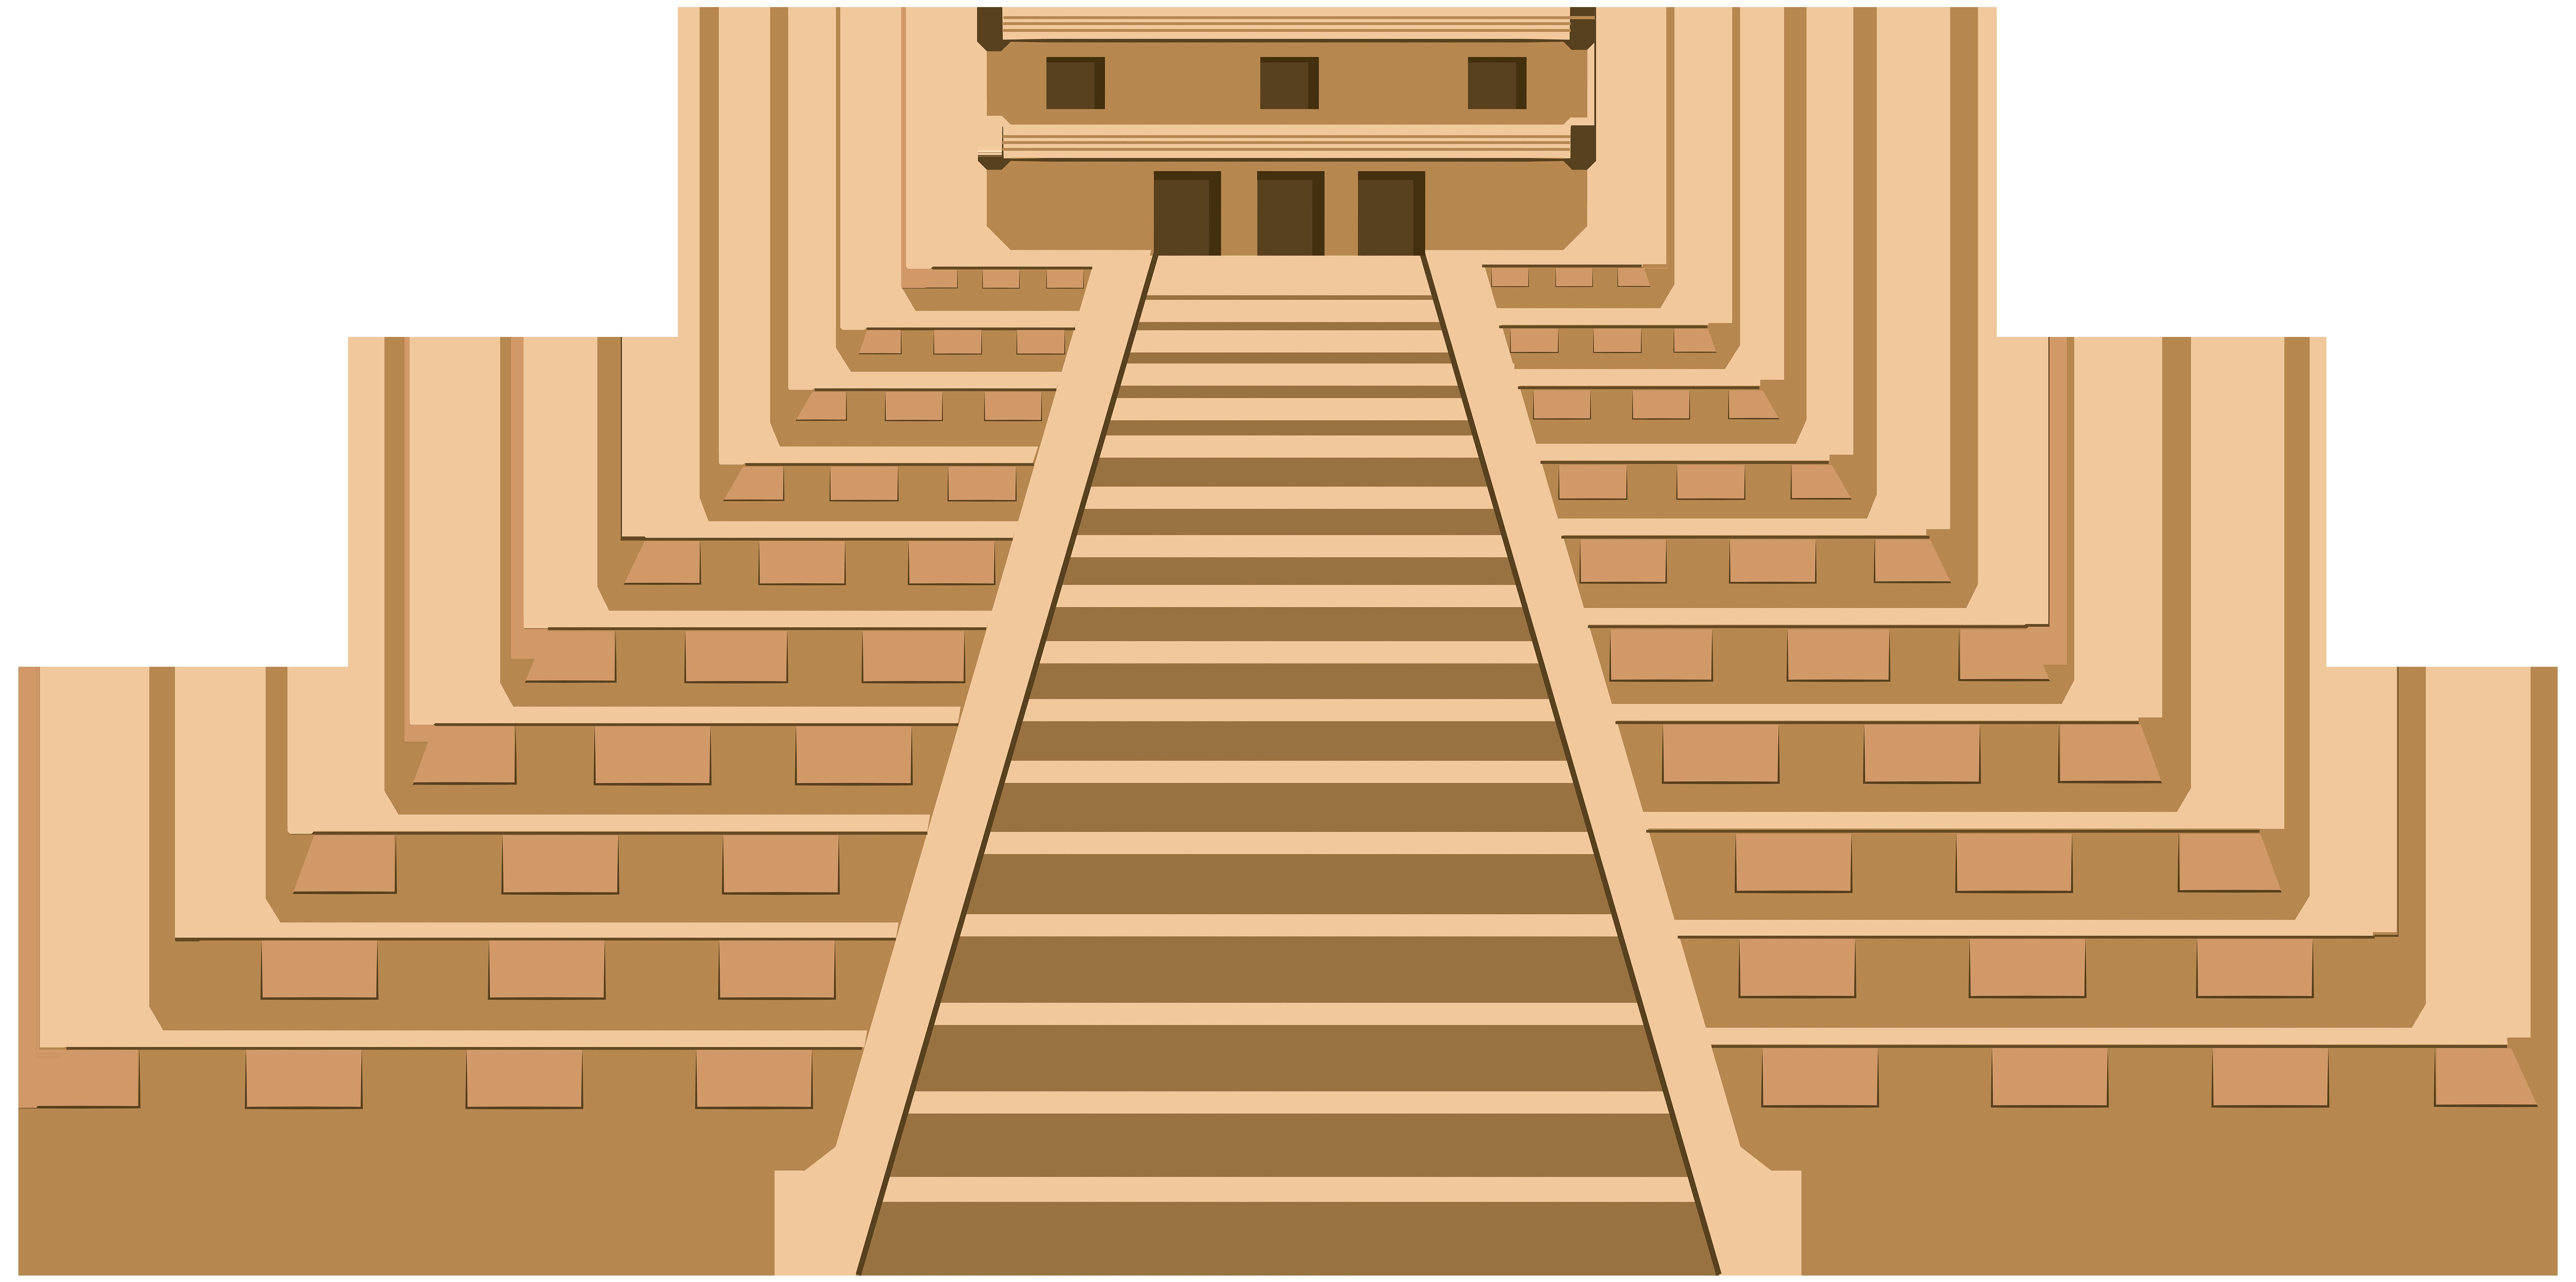 clipart library Chichen itza pyramid png. Pyramids clipart brick